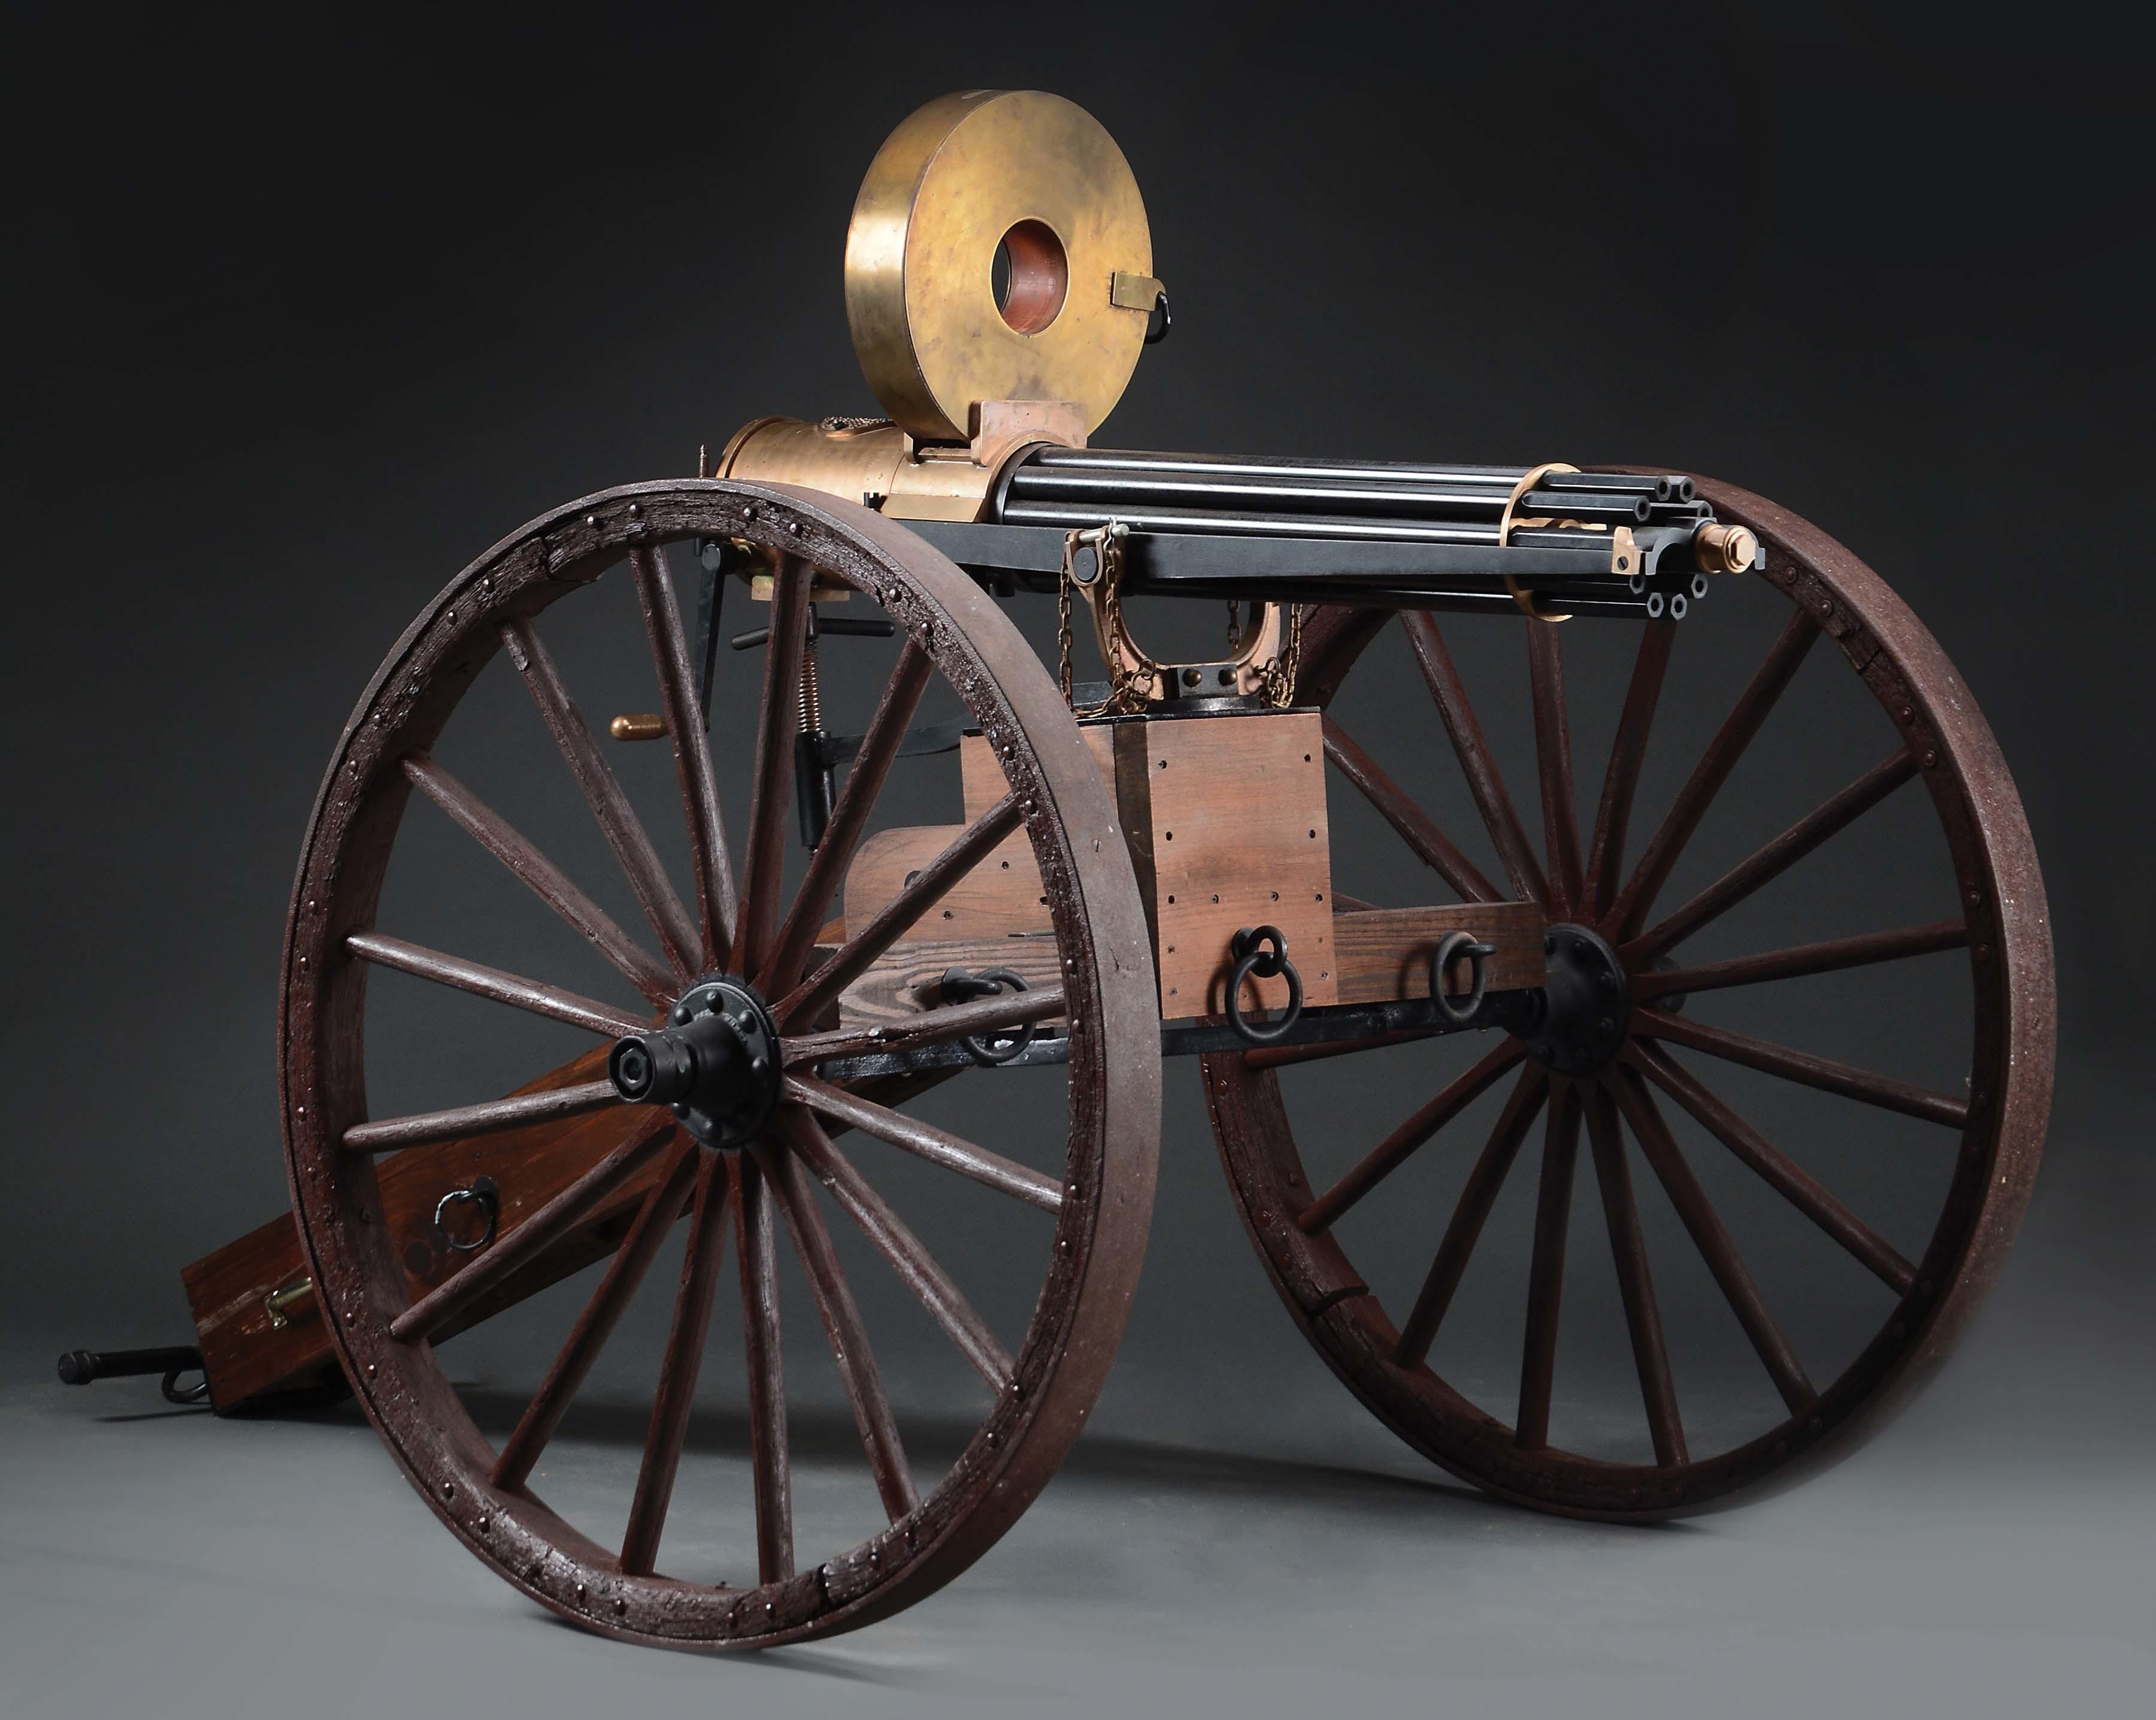 Colt 1874 Gatling Gun